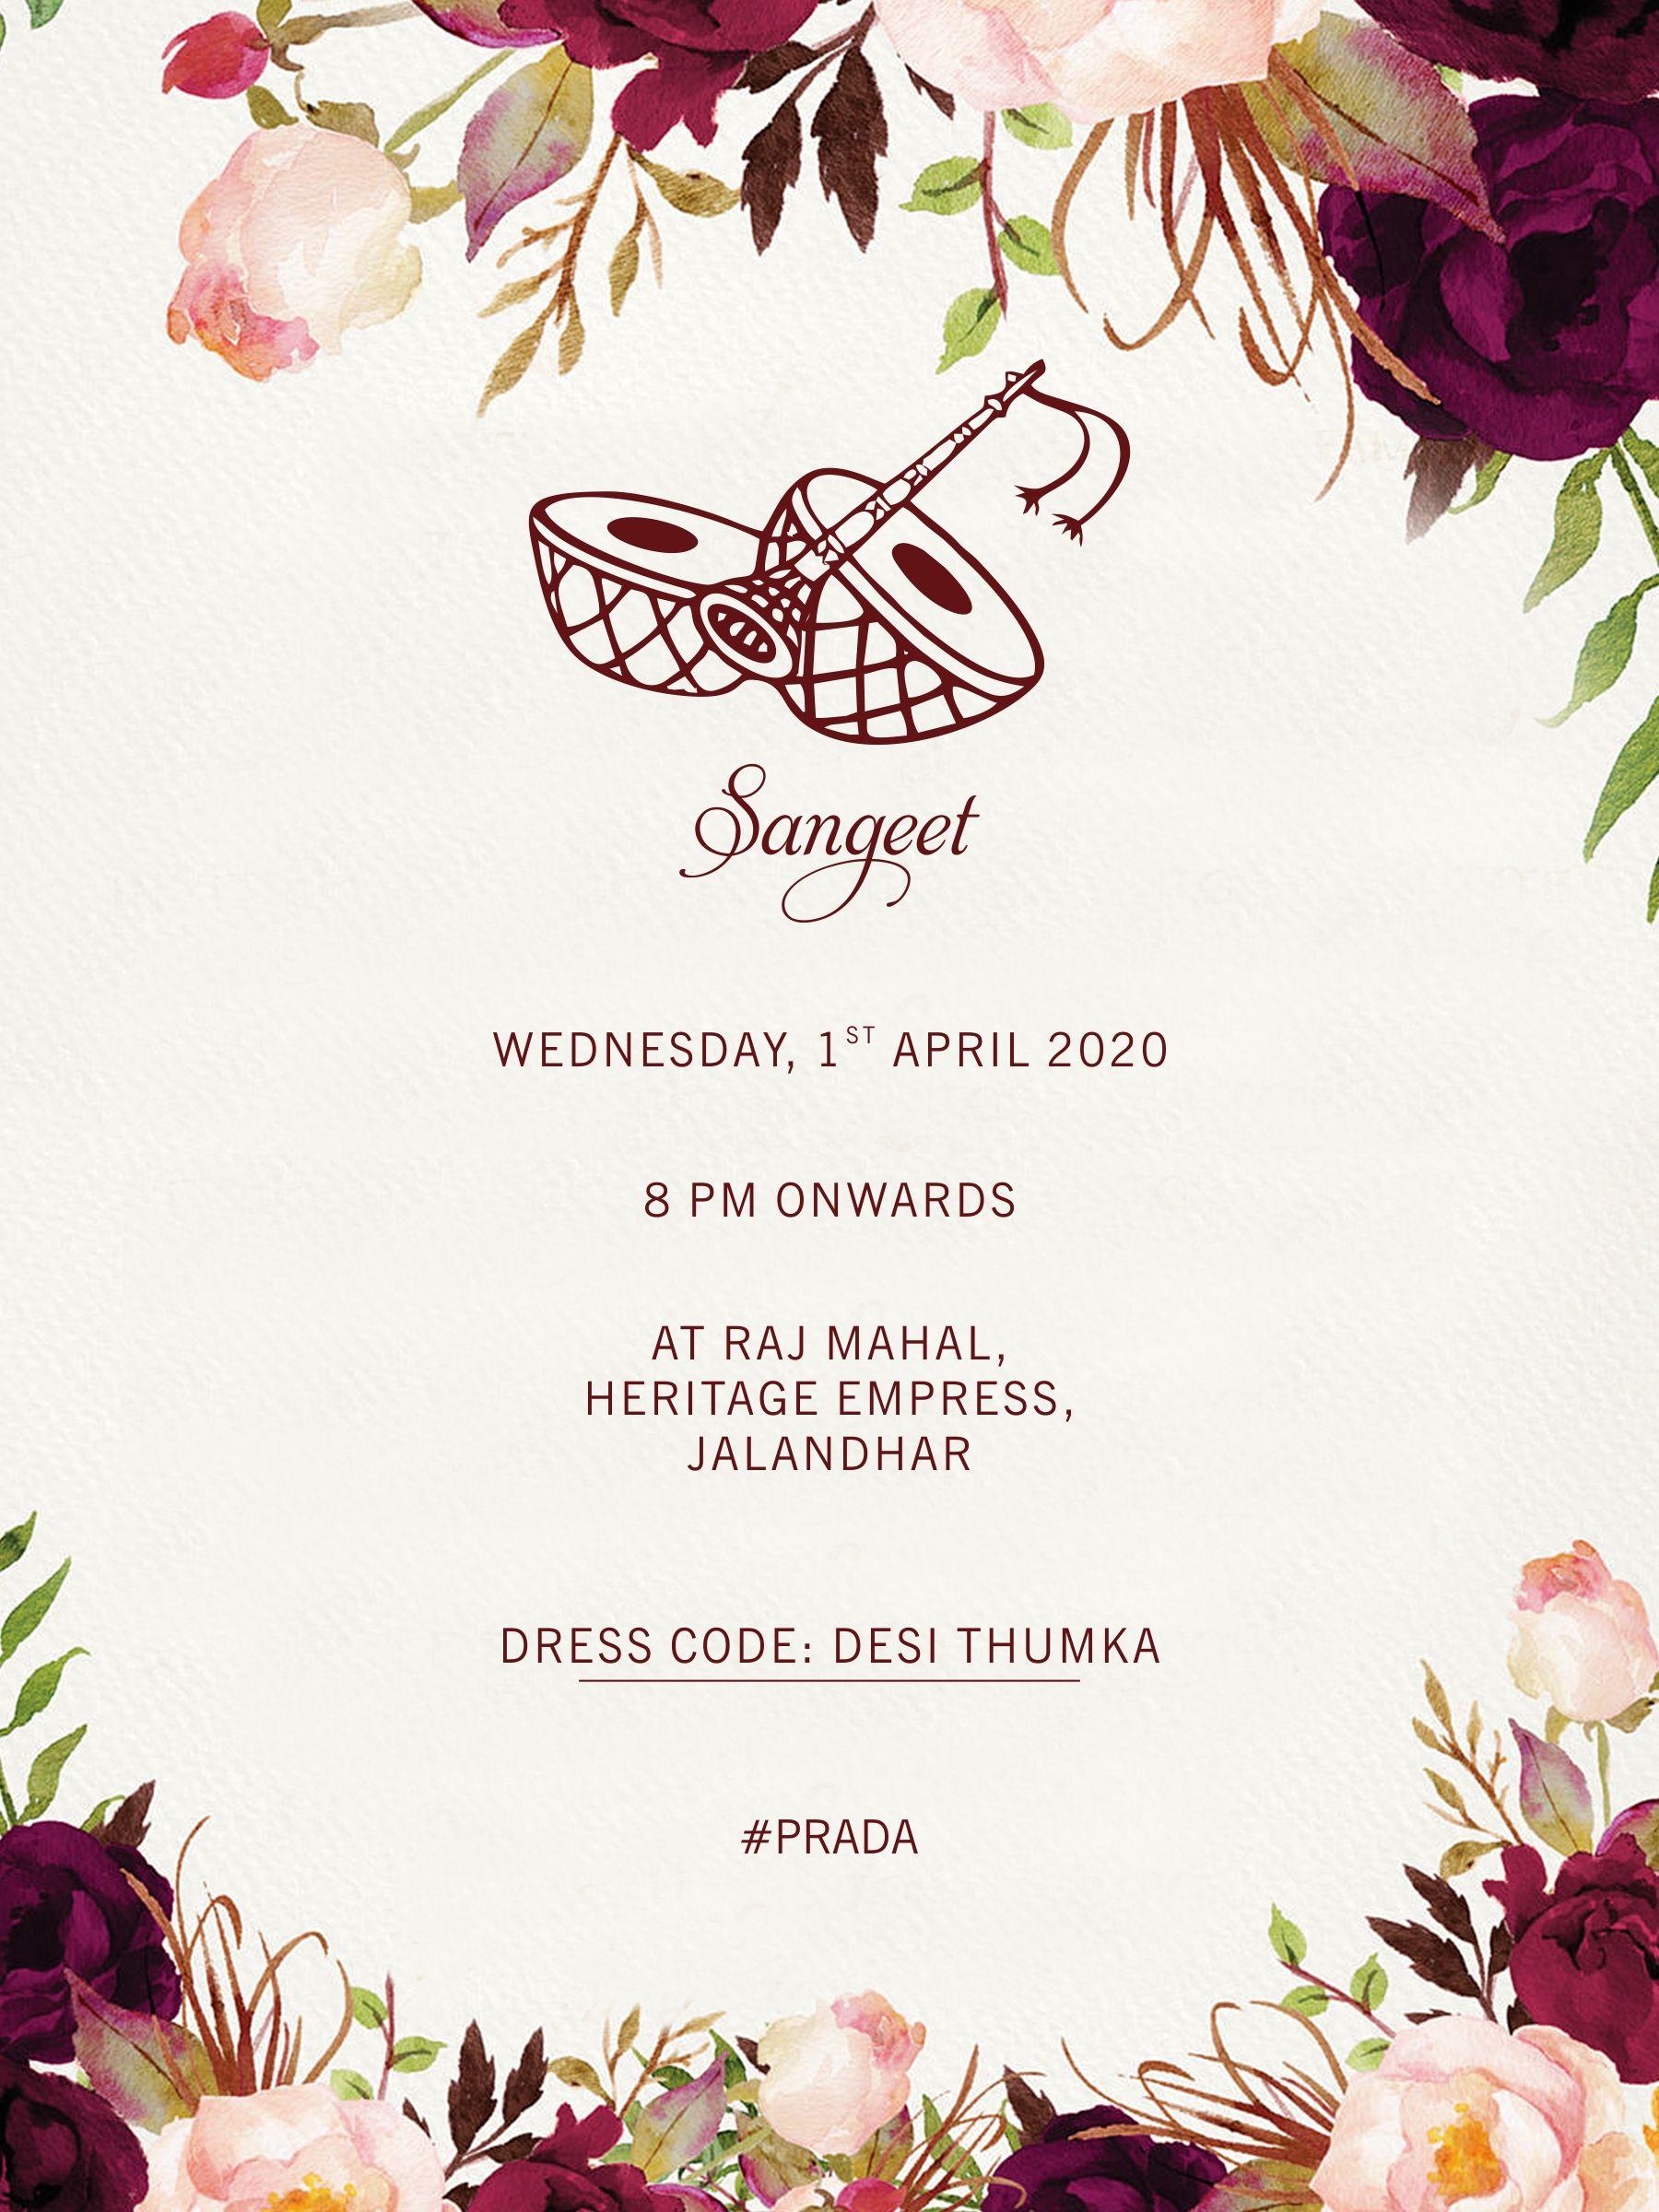 Best Digital Traditional Wedding Invitation Indian Marriage Invitation Cards Social Media Marketing Agency Bangle Ceremony Social Media Marketing